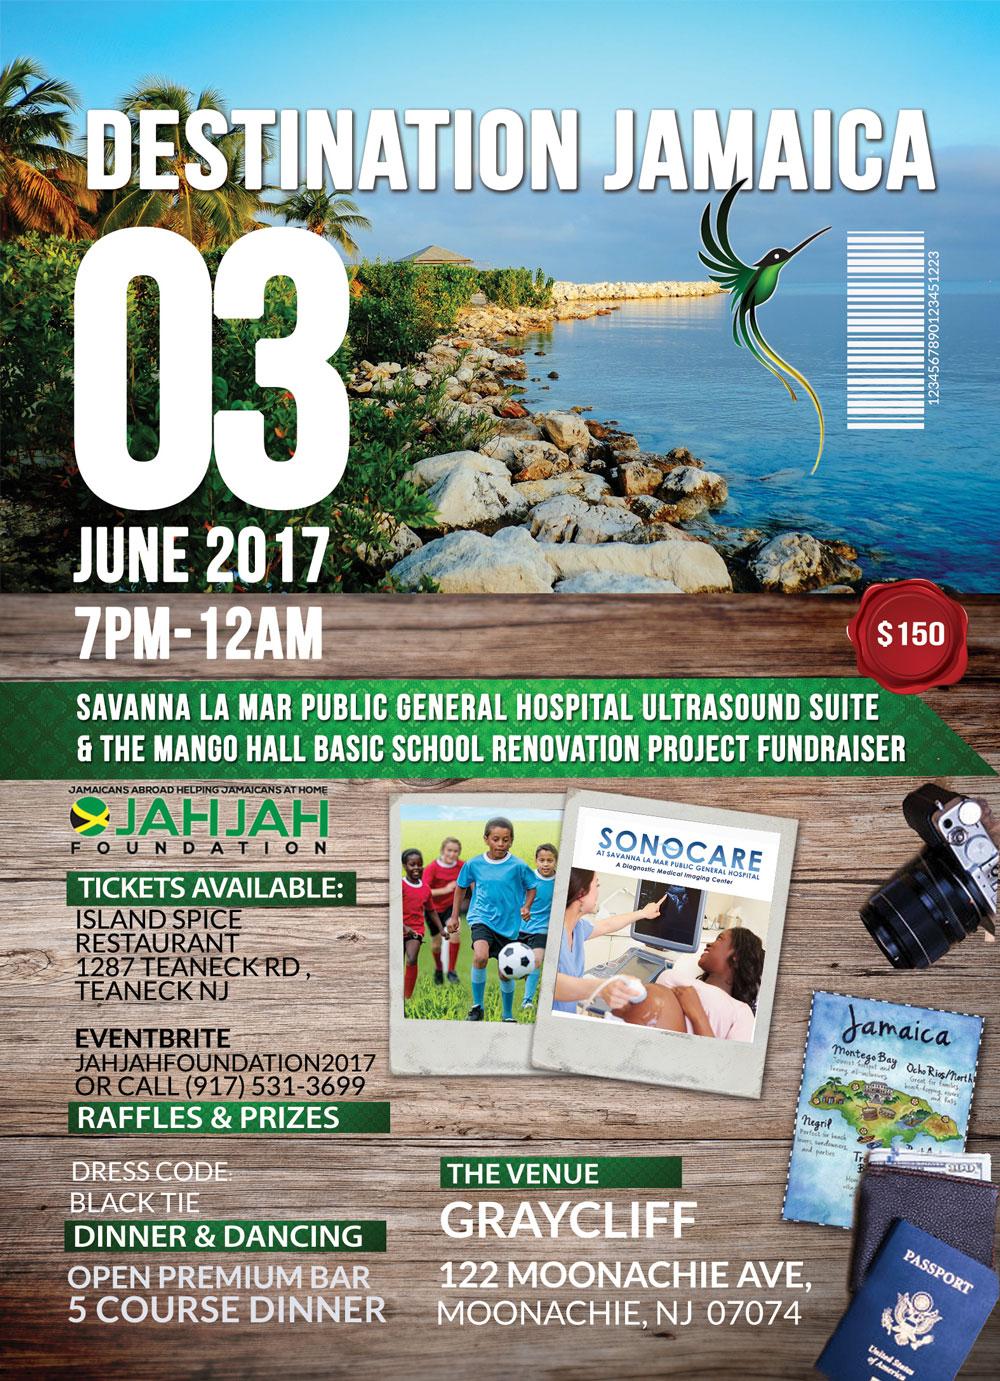 Destination Jamaica Fundraiser